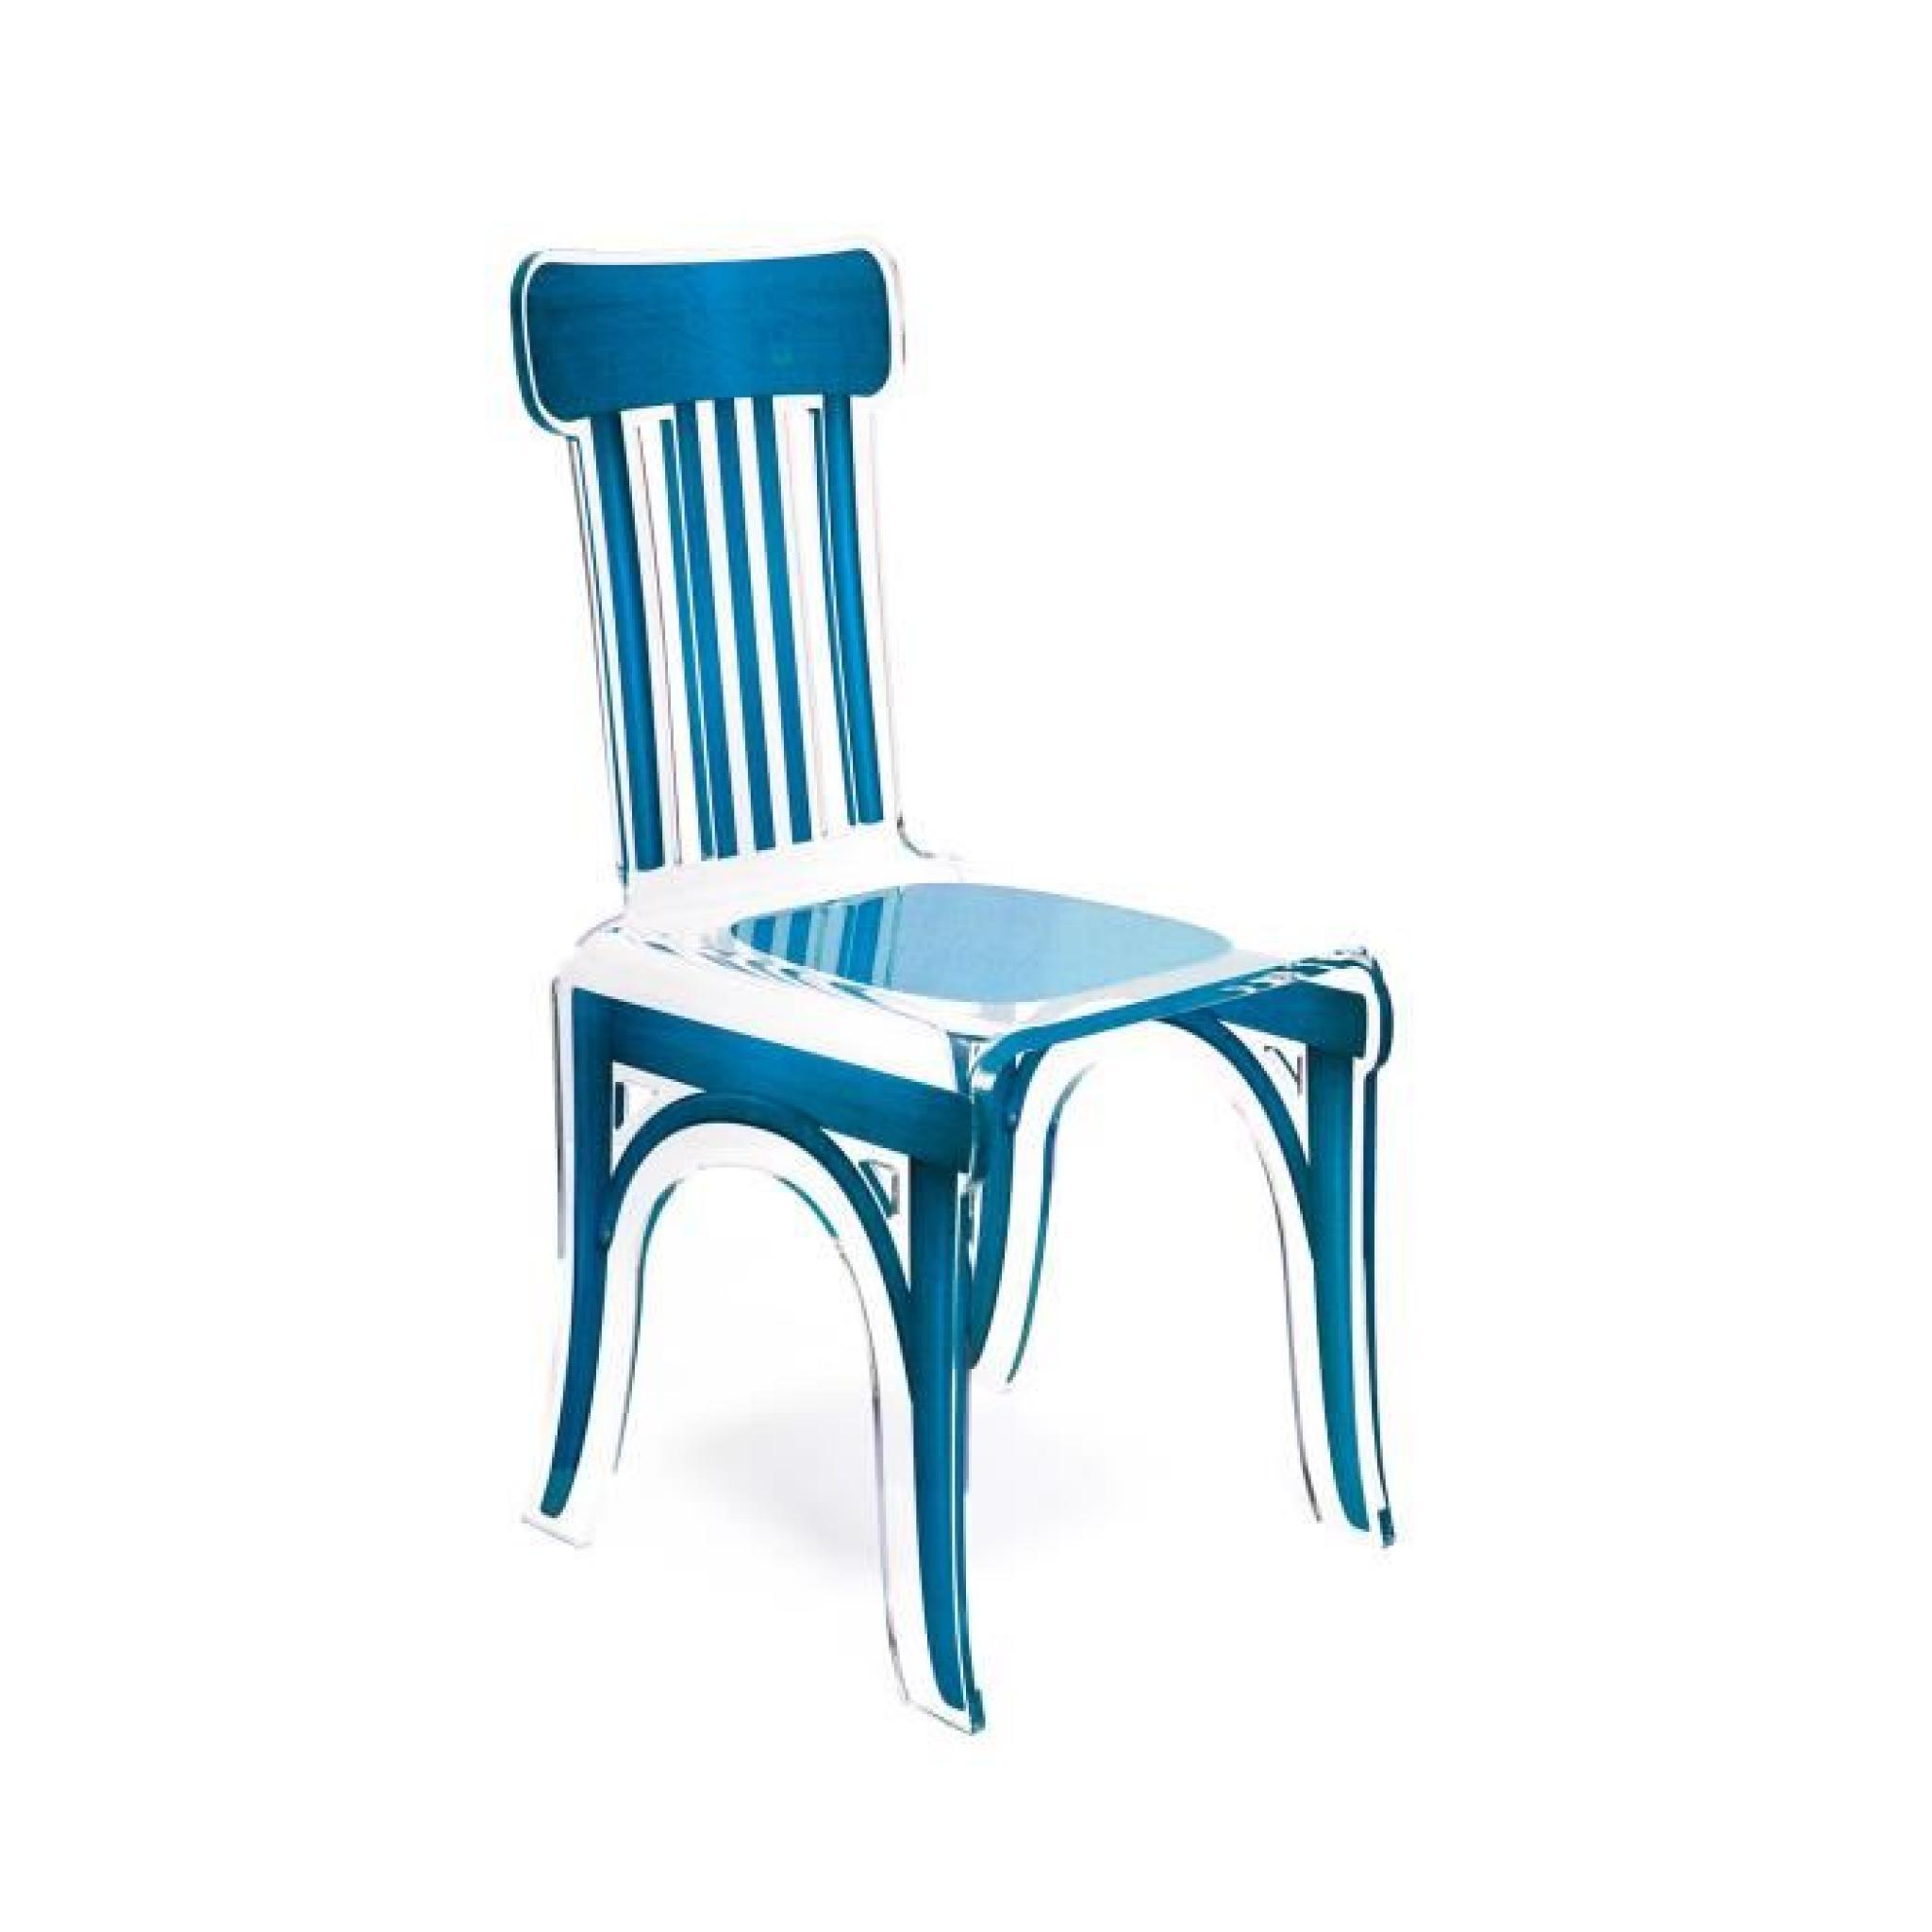 Acrila Chaise Bistrot Bleu